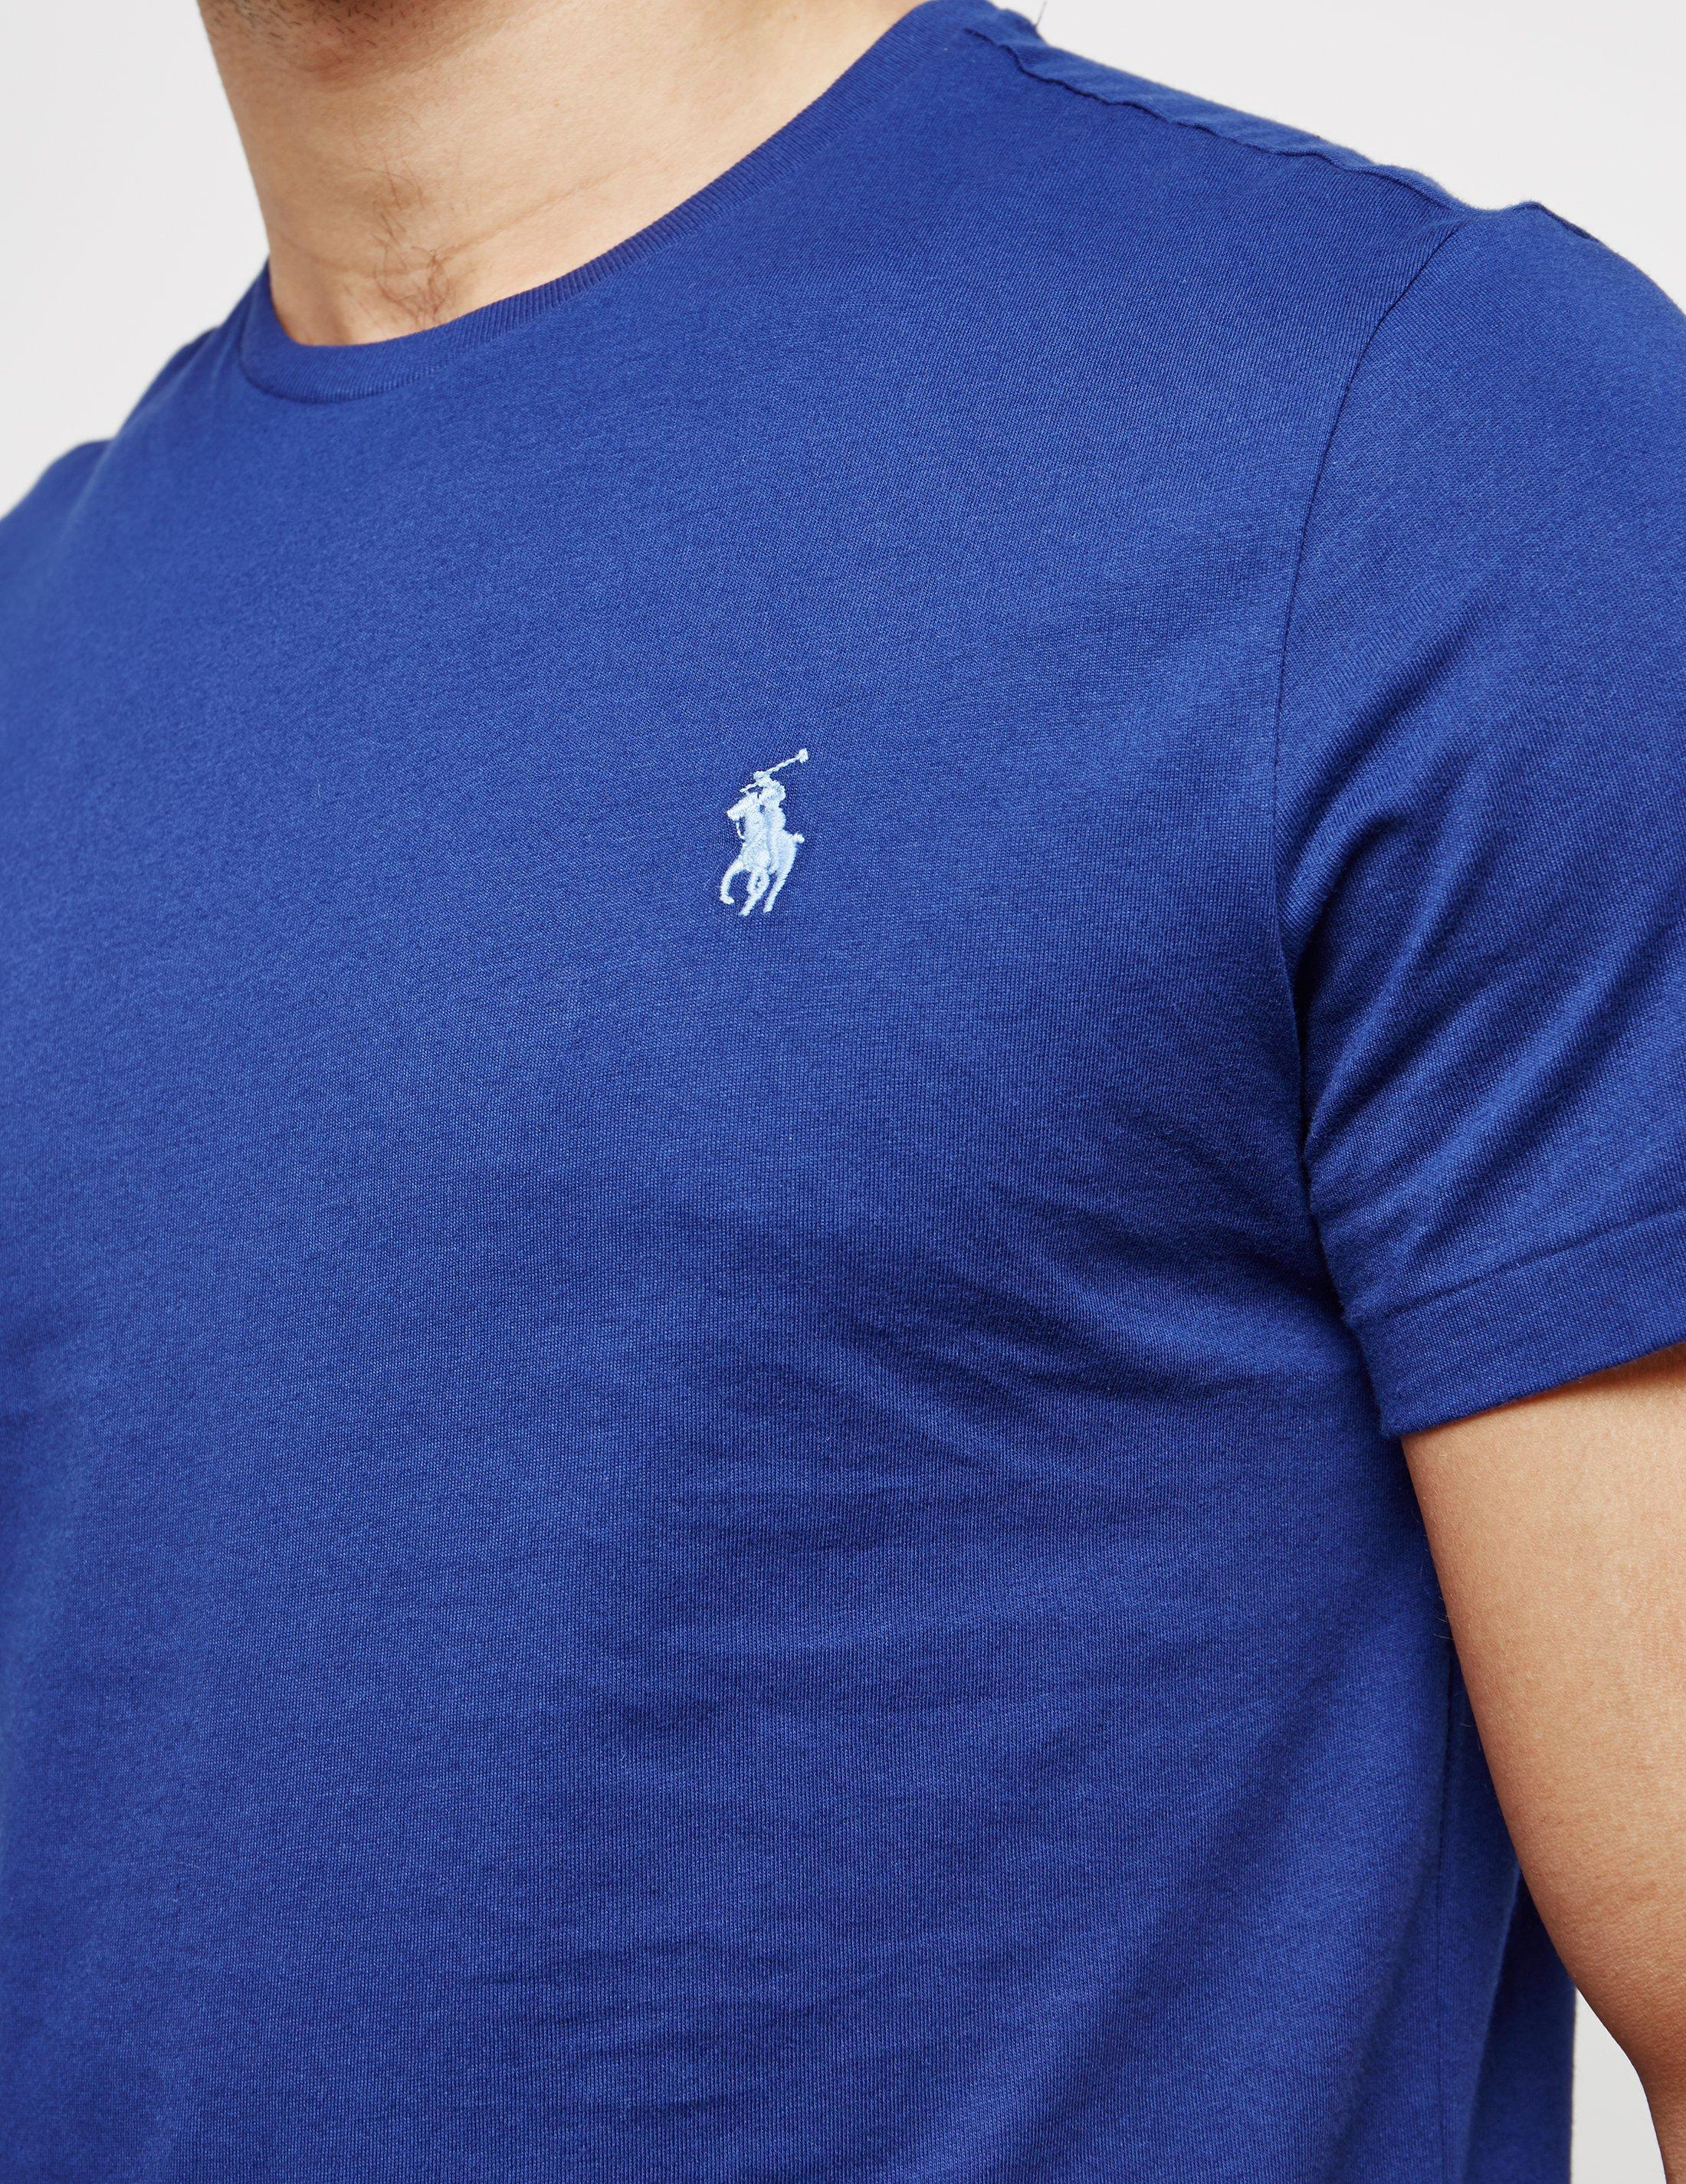 89df002fd9e1 Polo Ralph Lauren Mens Crew Neck Short Sleeve T-shirt Royal Blue in ...